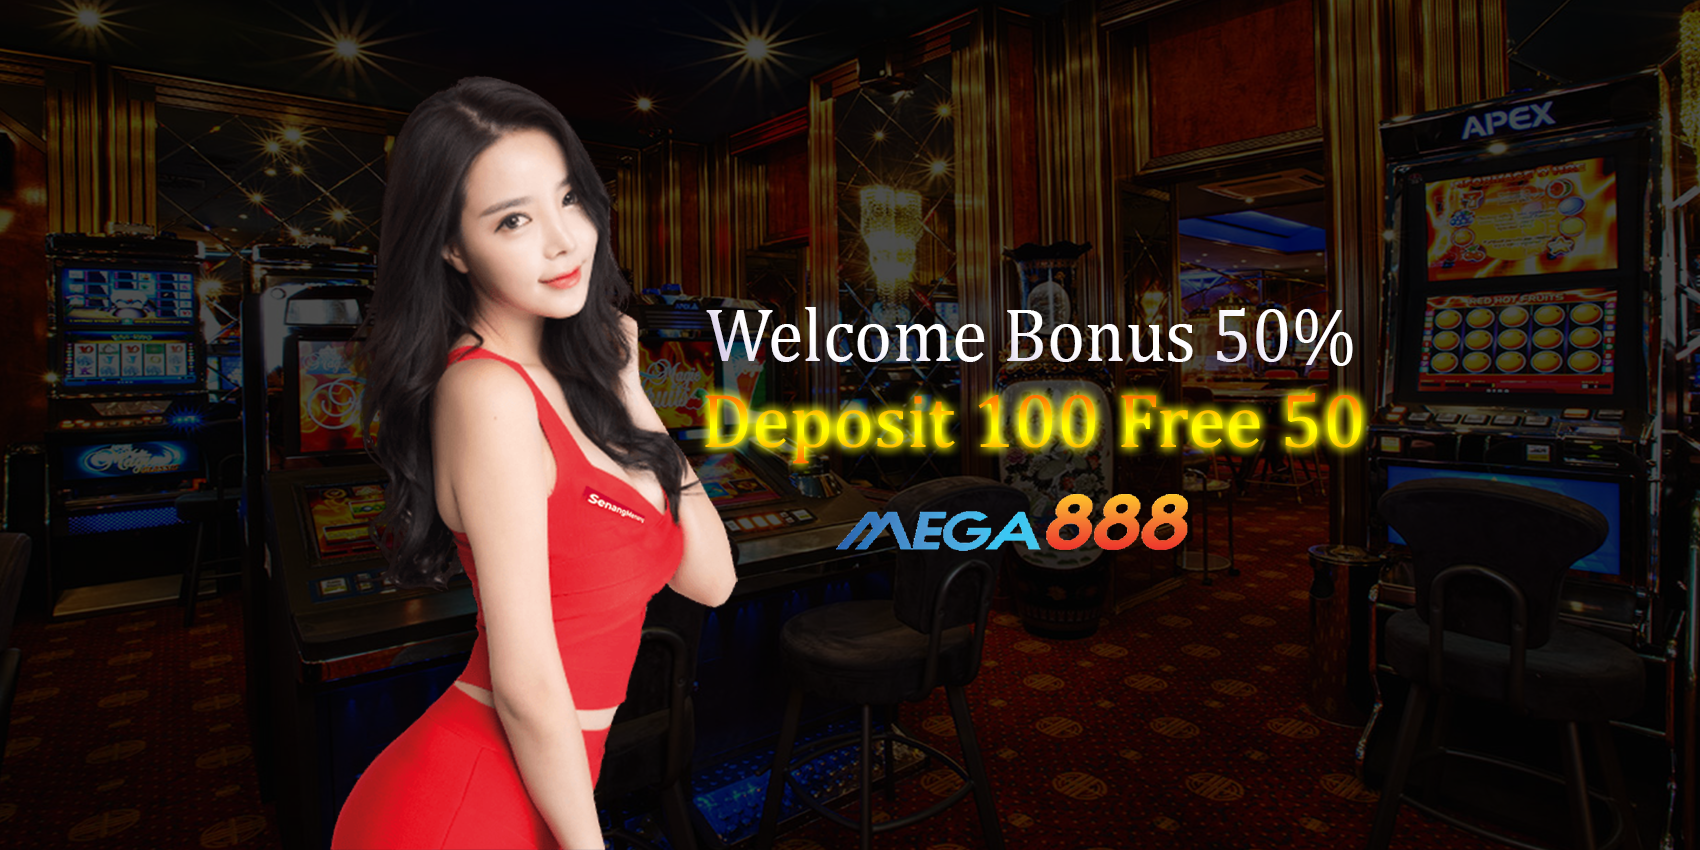 ENJOY MEGA888 ANYWHERE ANYTIME Online casino, Enjoyment